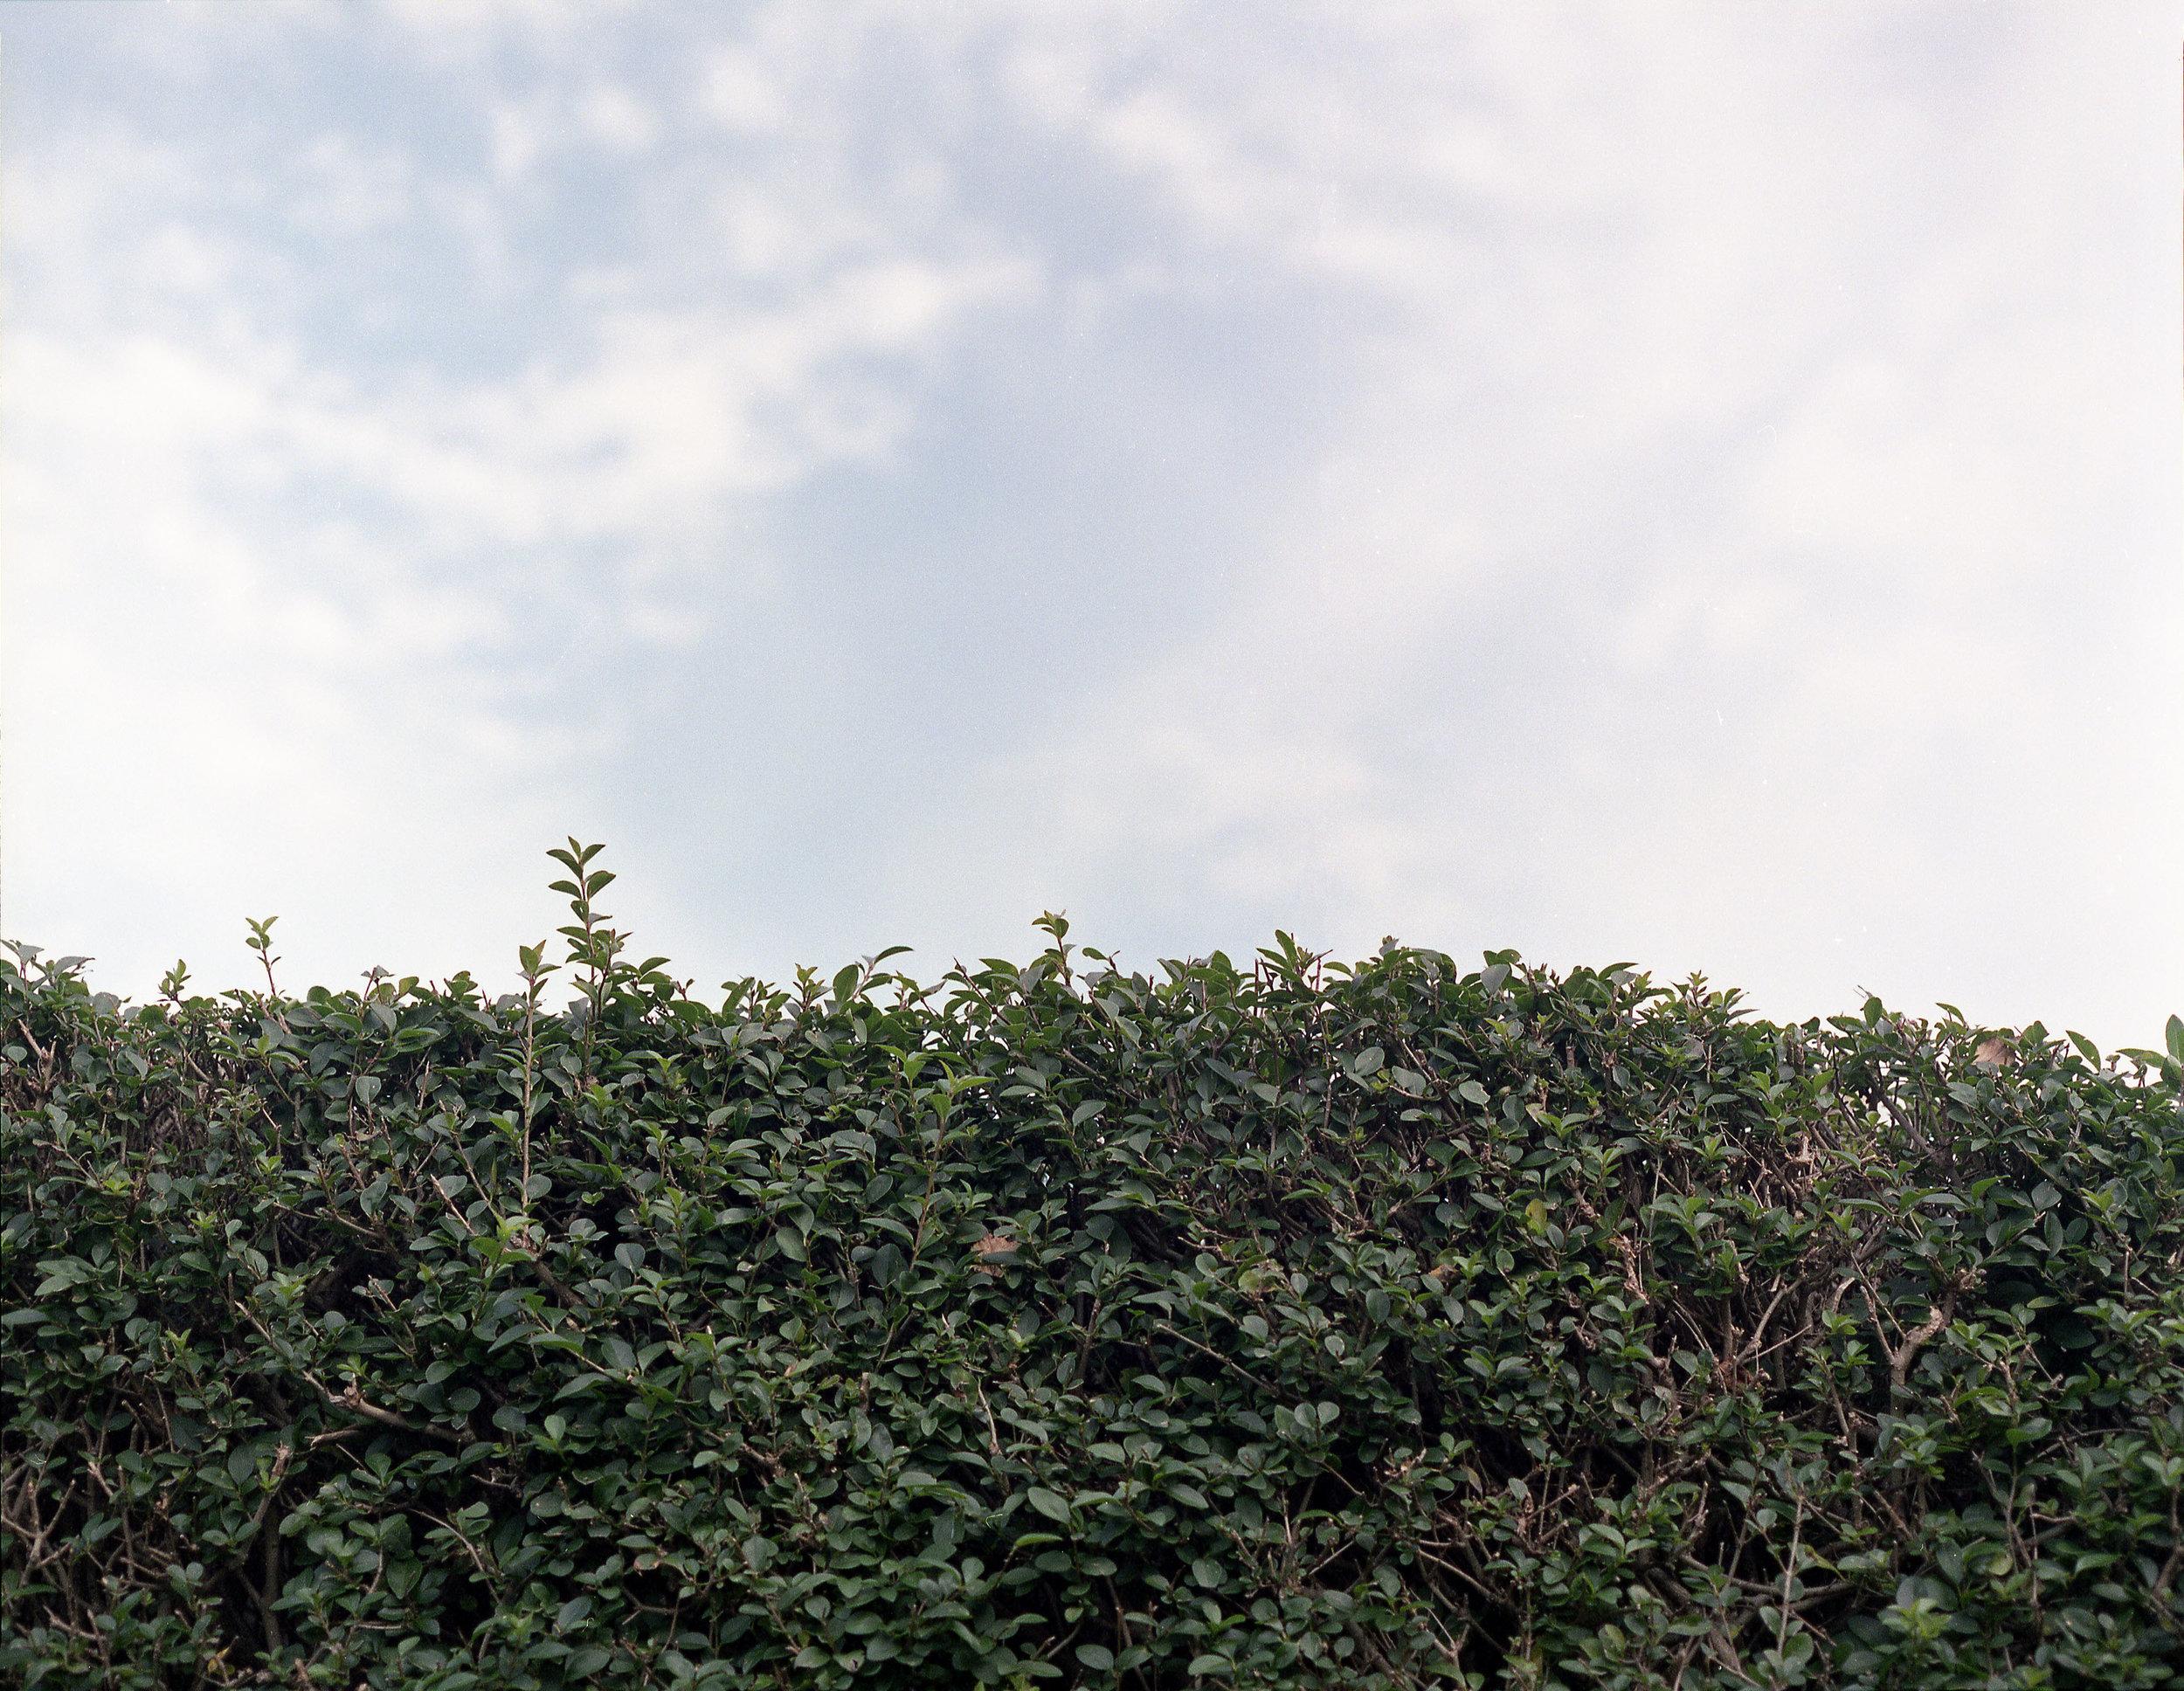 2014-Leeds-009-300.jpg